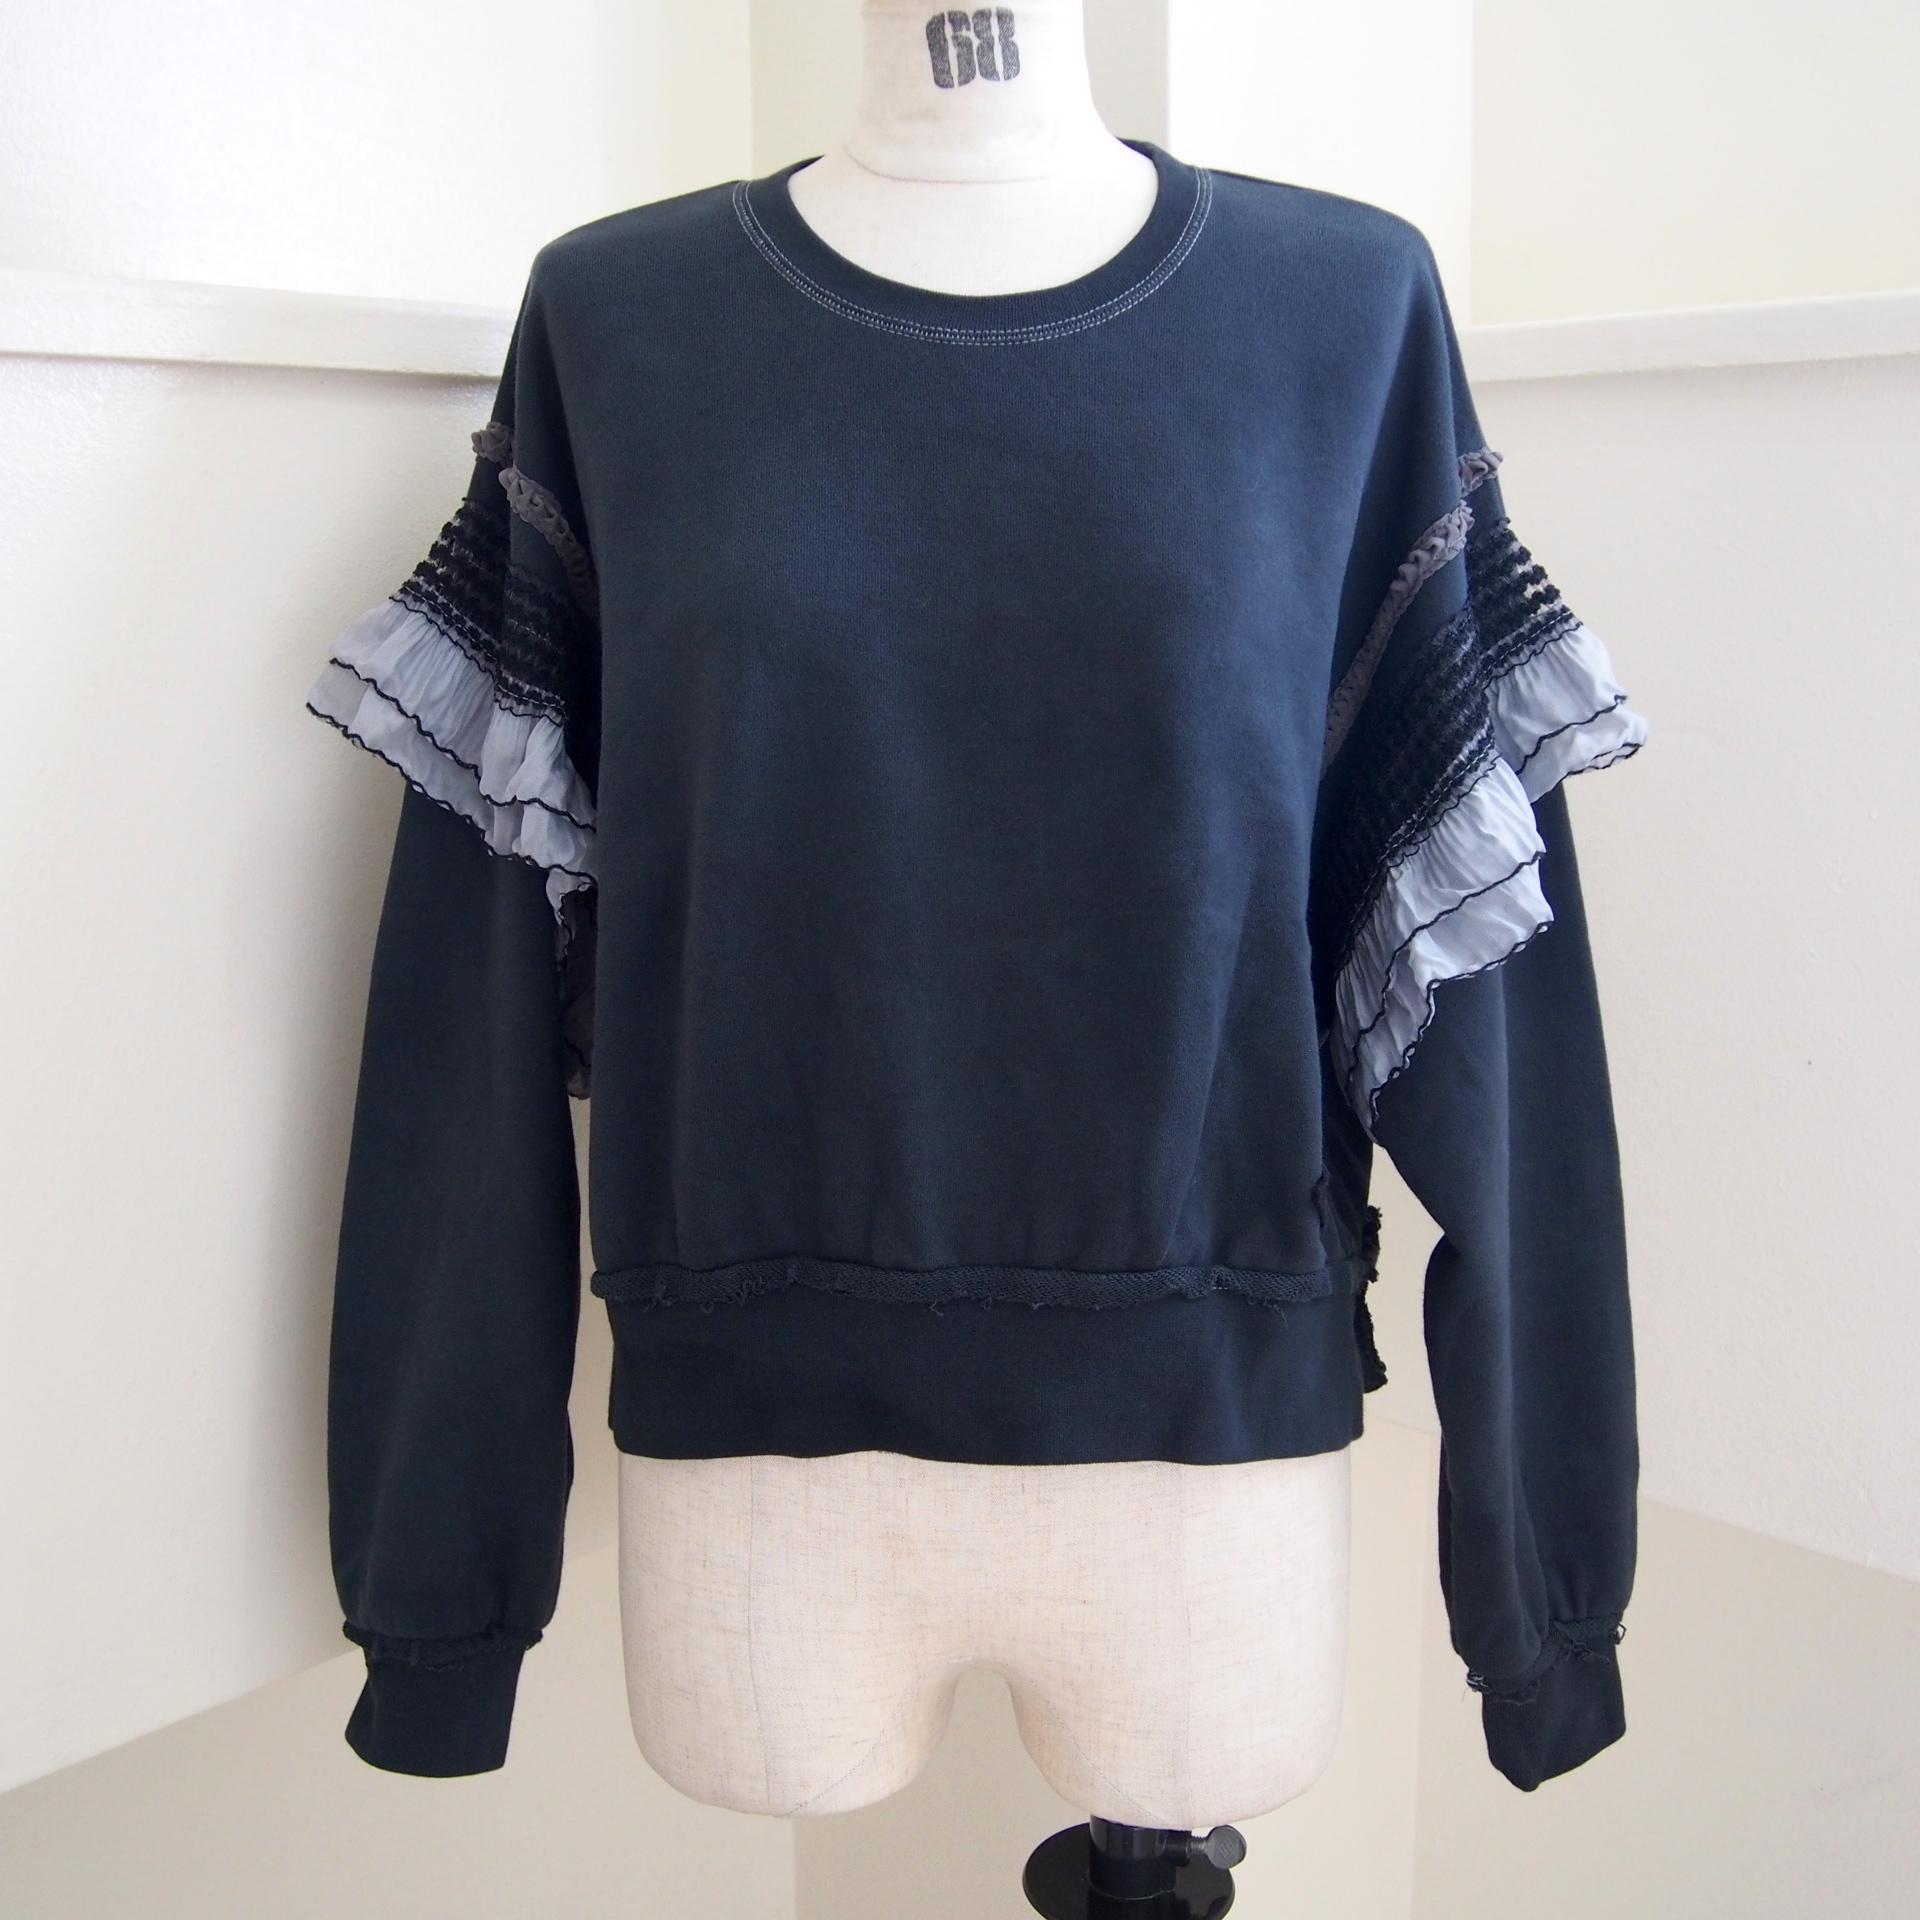 【RehersalL】 pleats shoulder pullover (sumi black) /【リハーズオール】プリーツショルダープルオーバー(スミブラック)